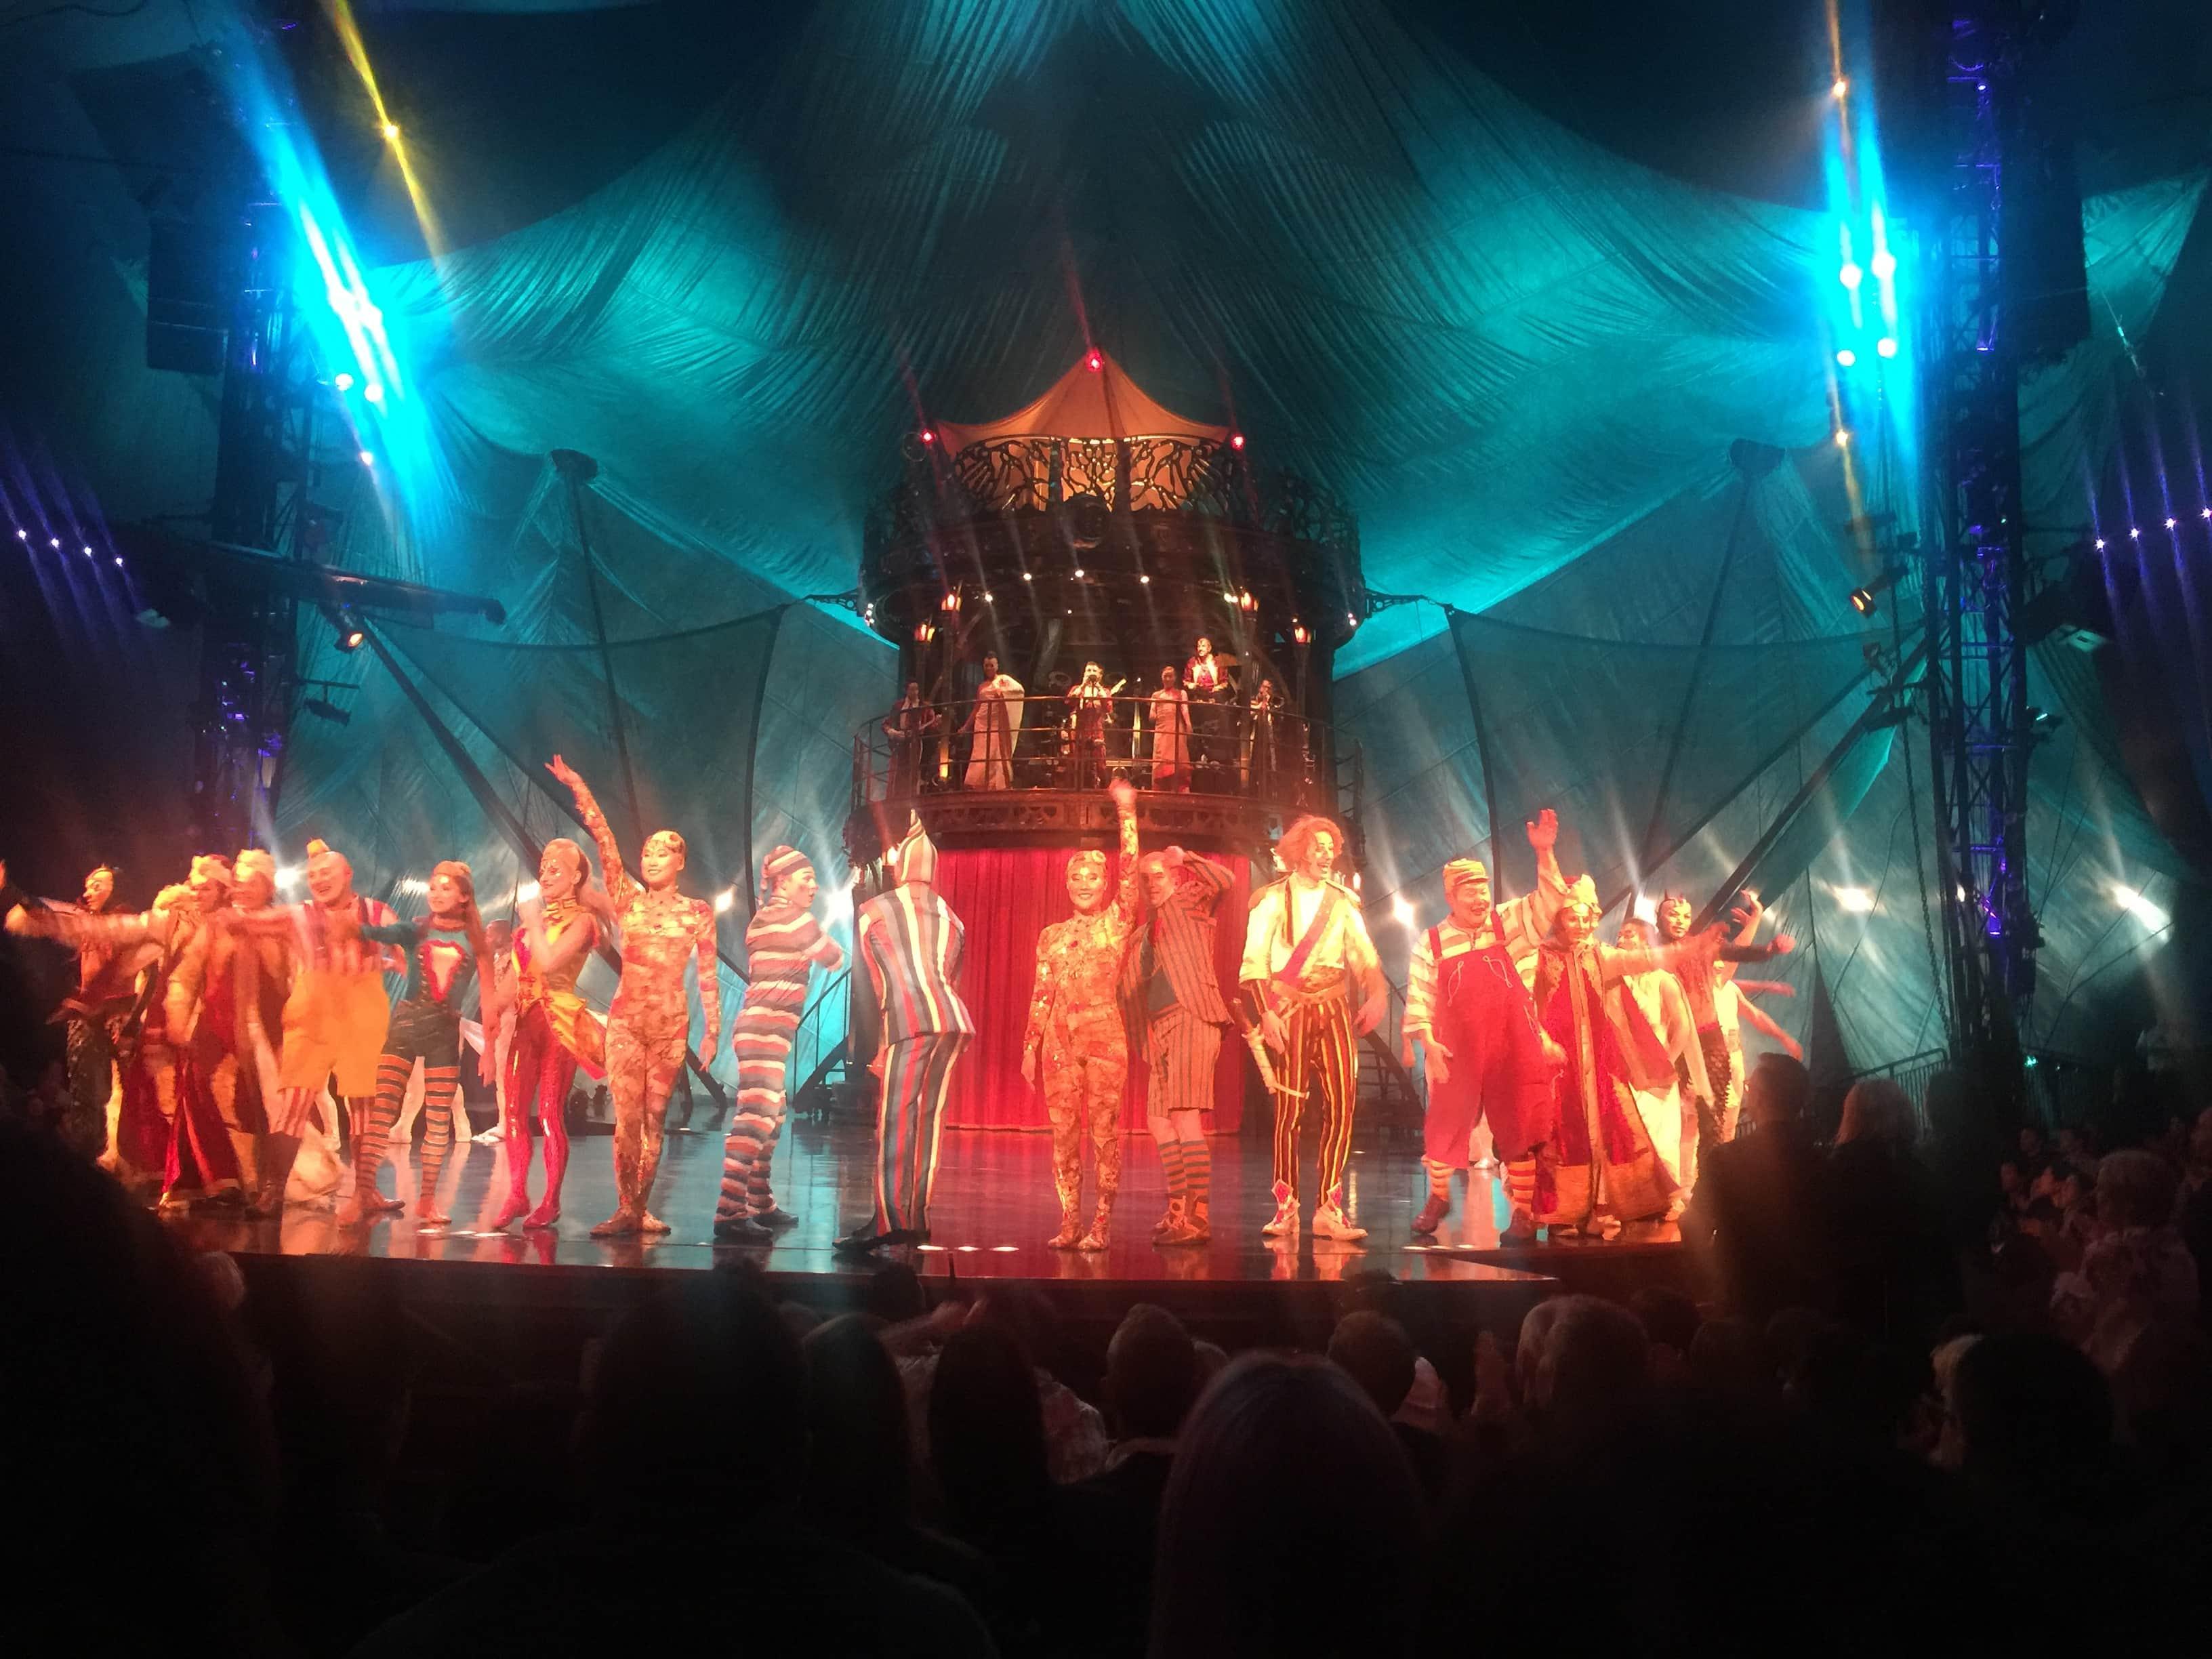 Kooza-cirque-du-soleil-review-6